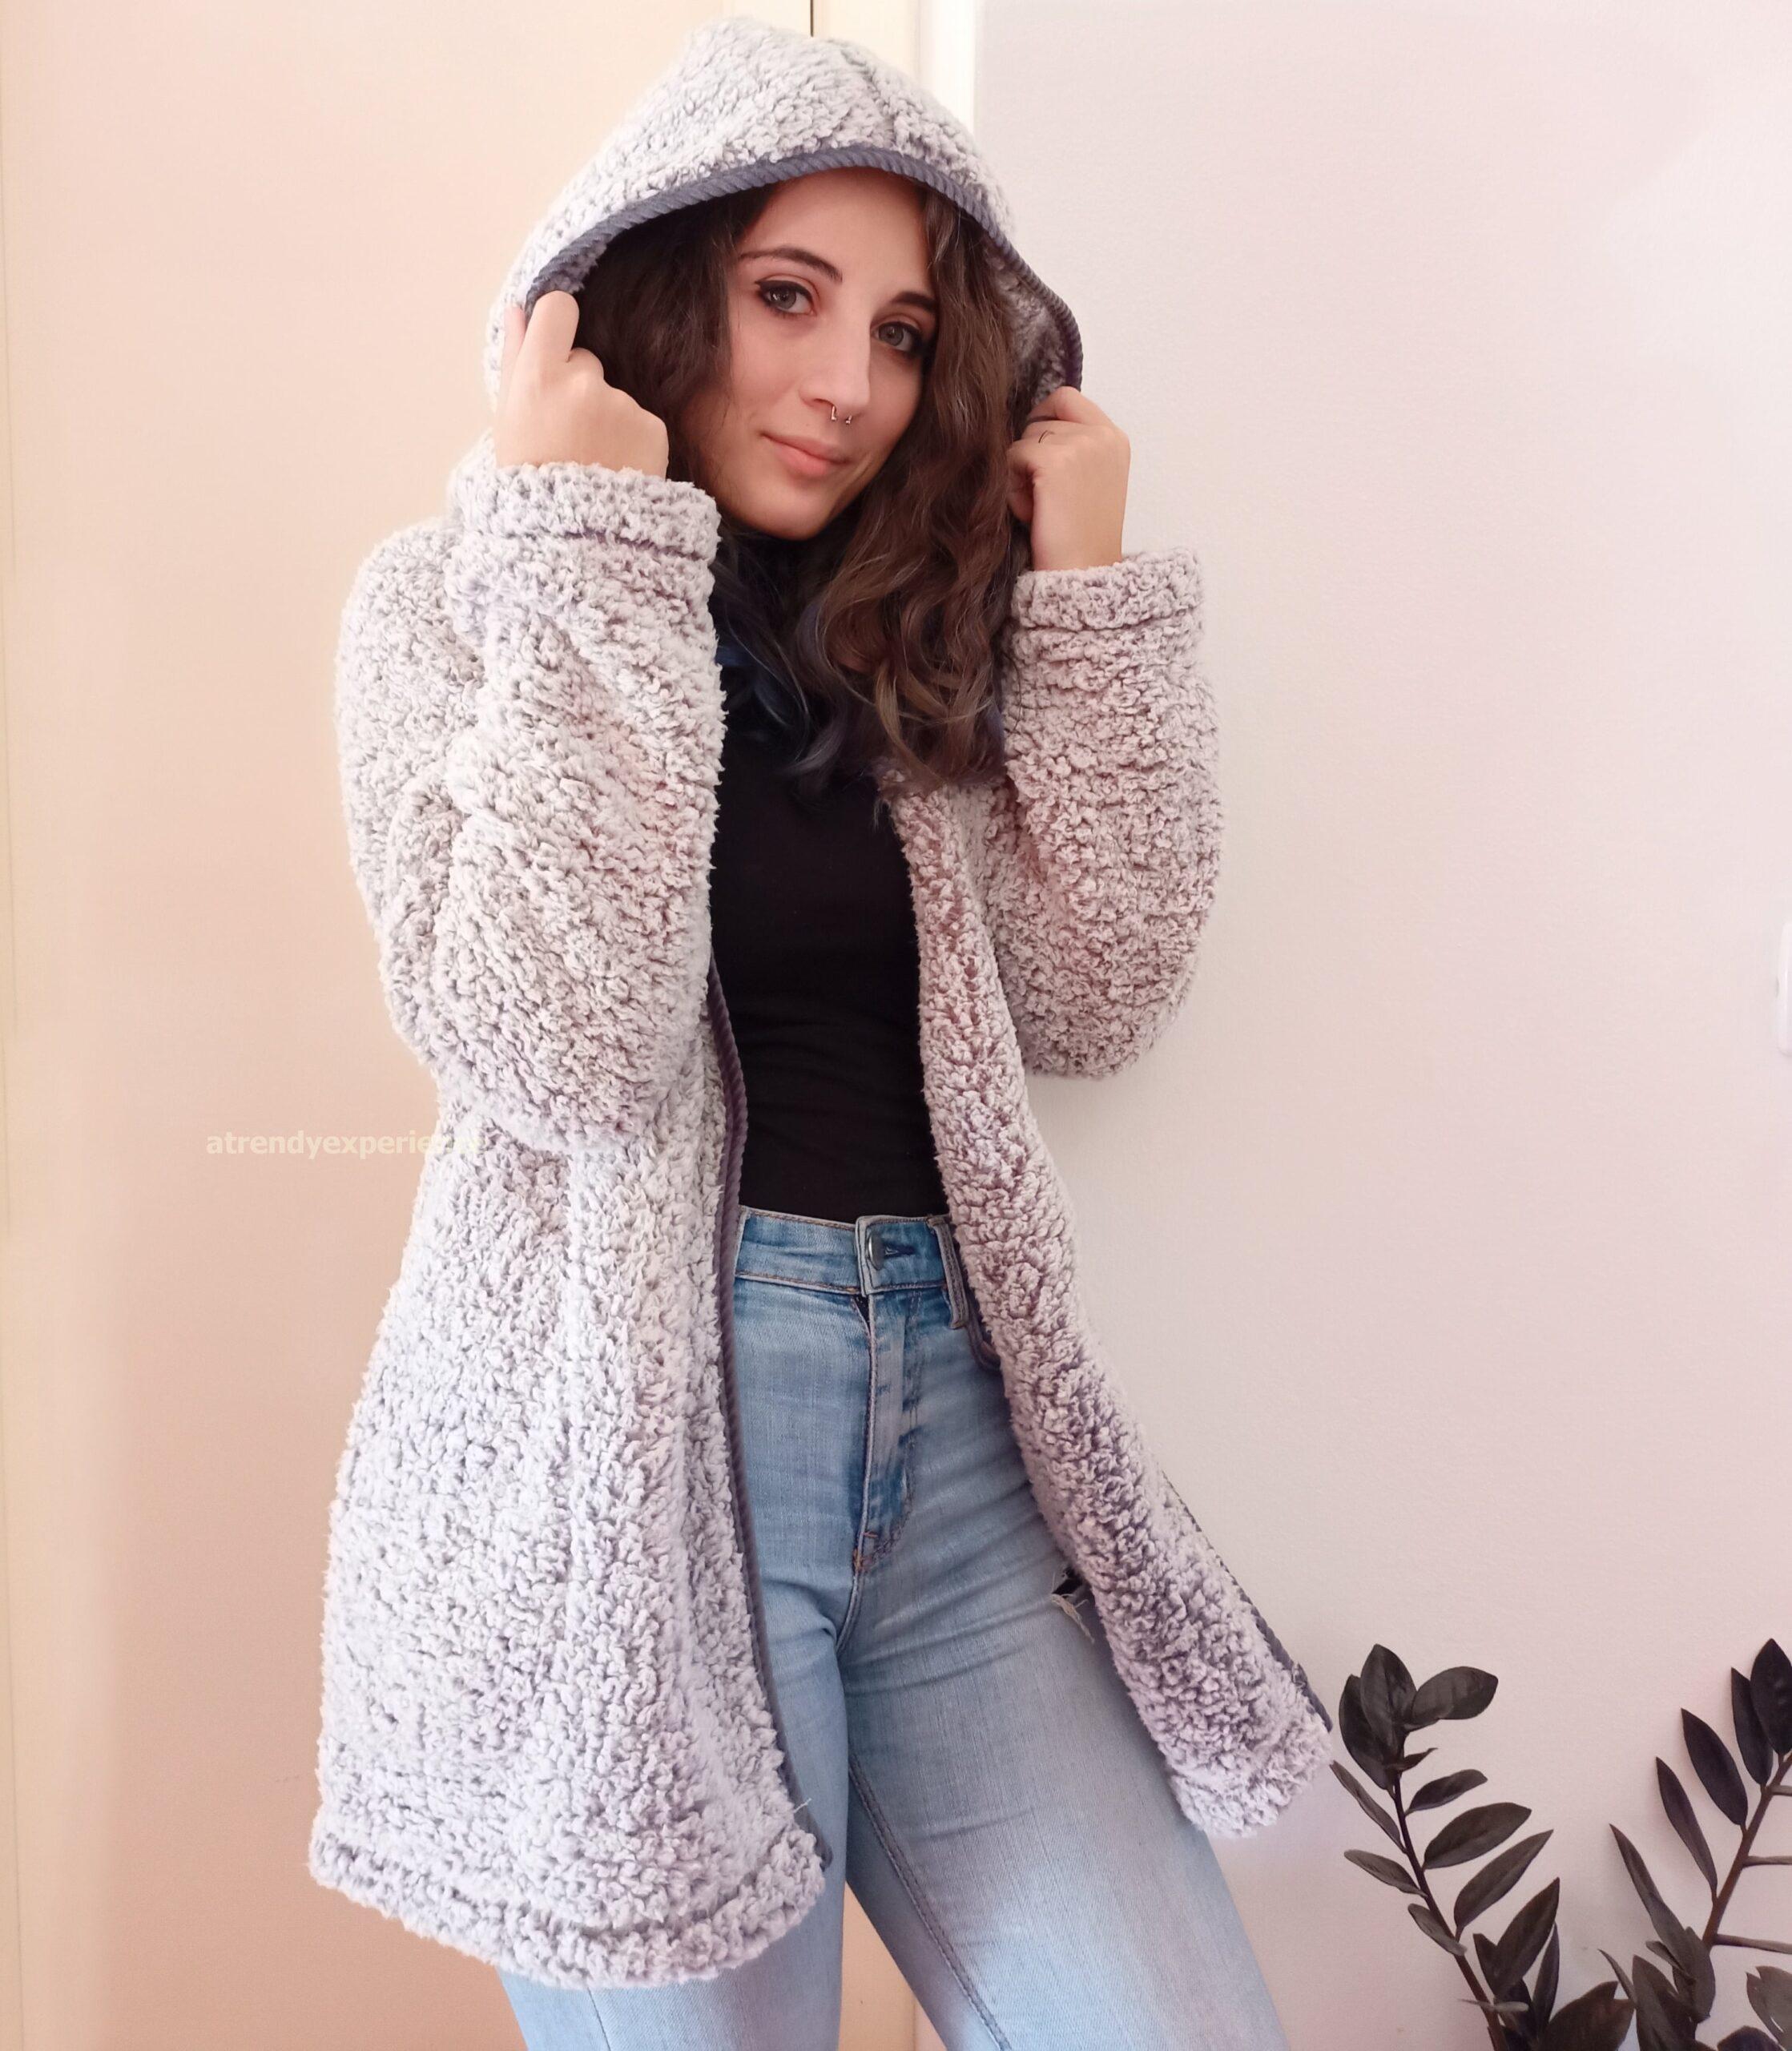 cappotto teddy coat ultime tendenze moda